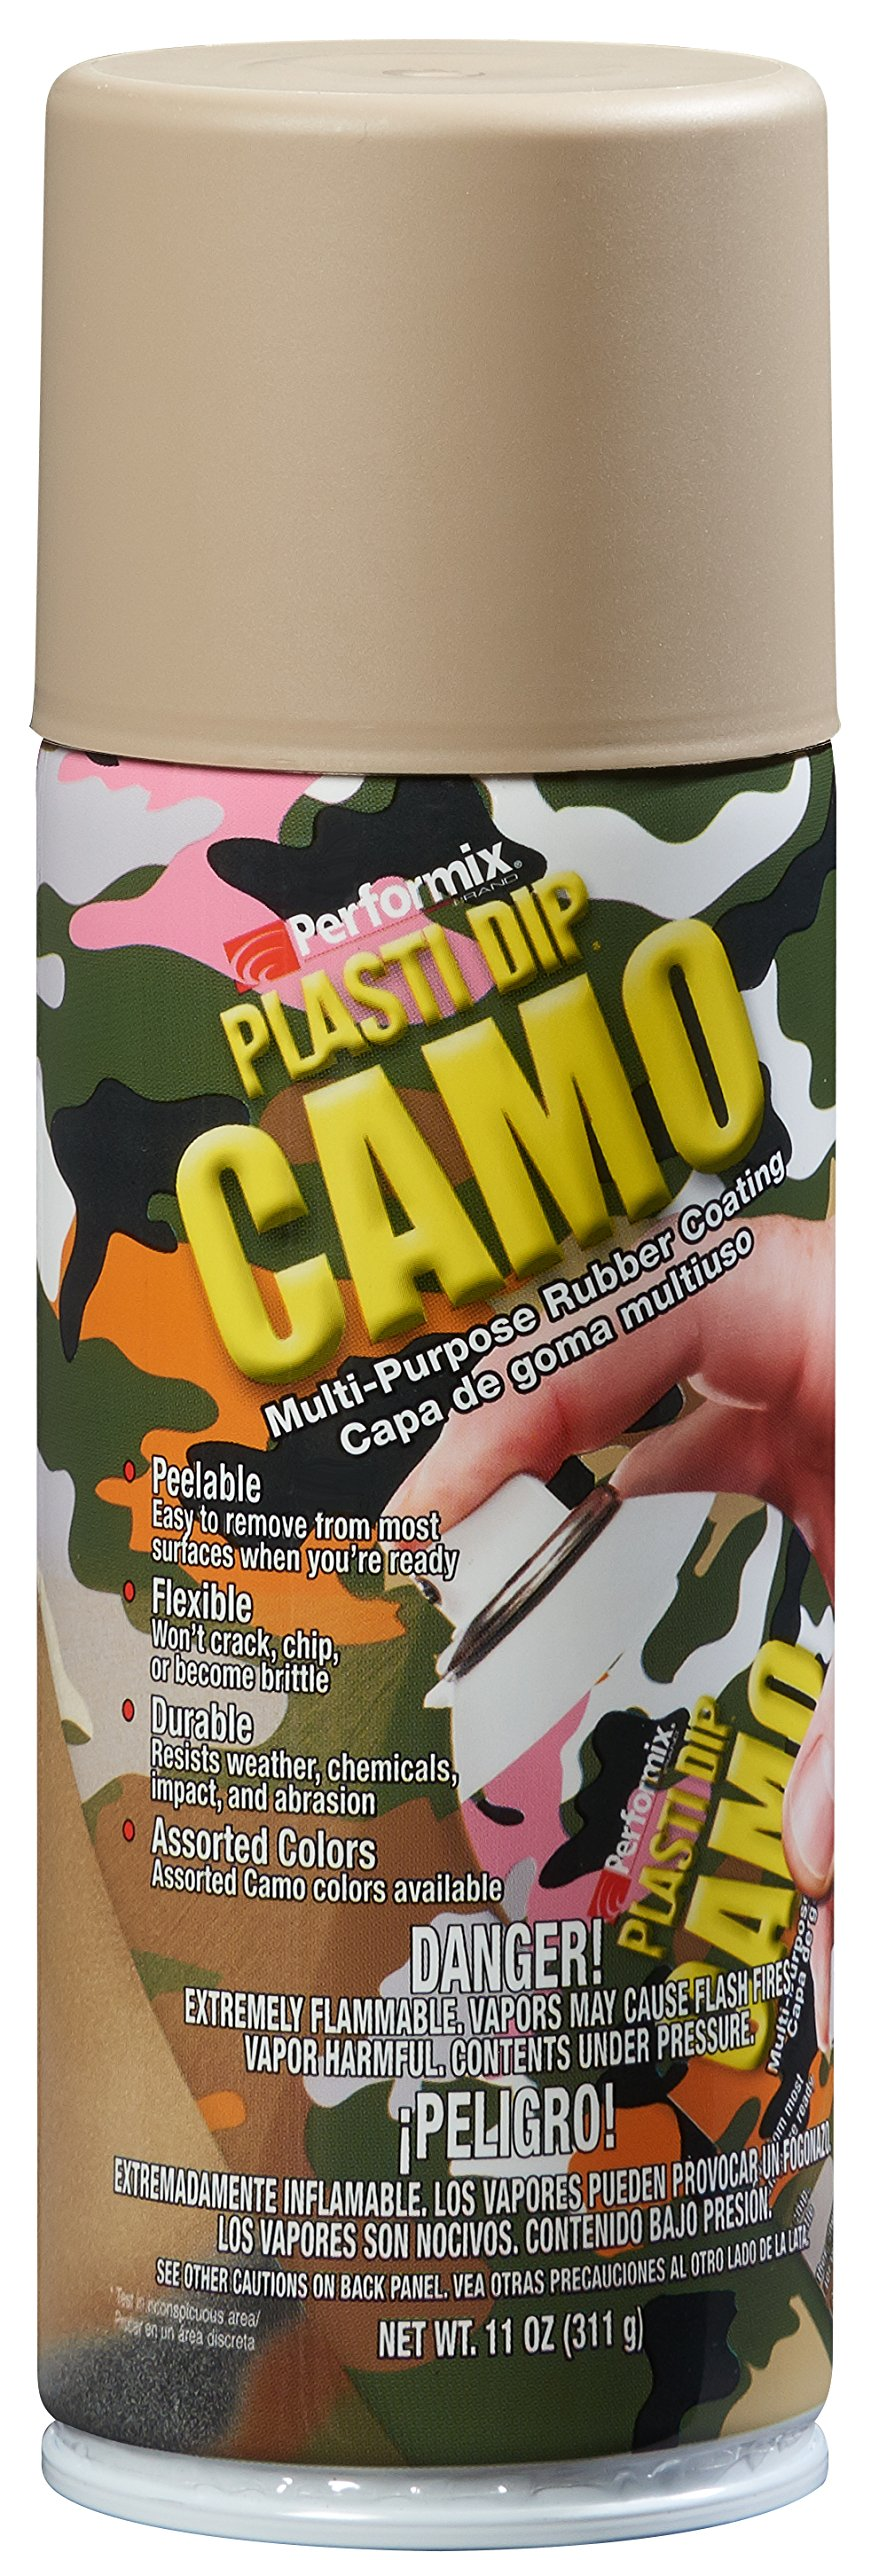 Plasti Dip Performix (11215-6-6PK) Tan Camo Spray - 11 oz. Aerosol, (Pack of 6)